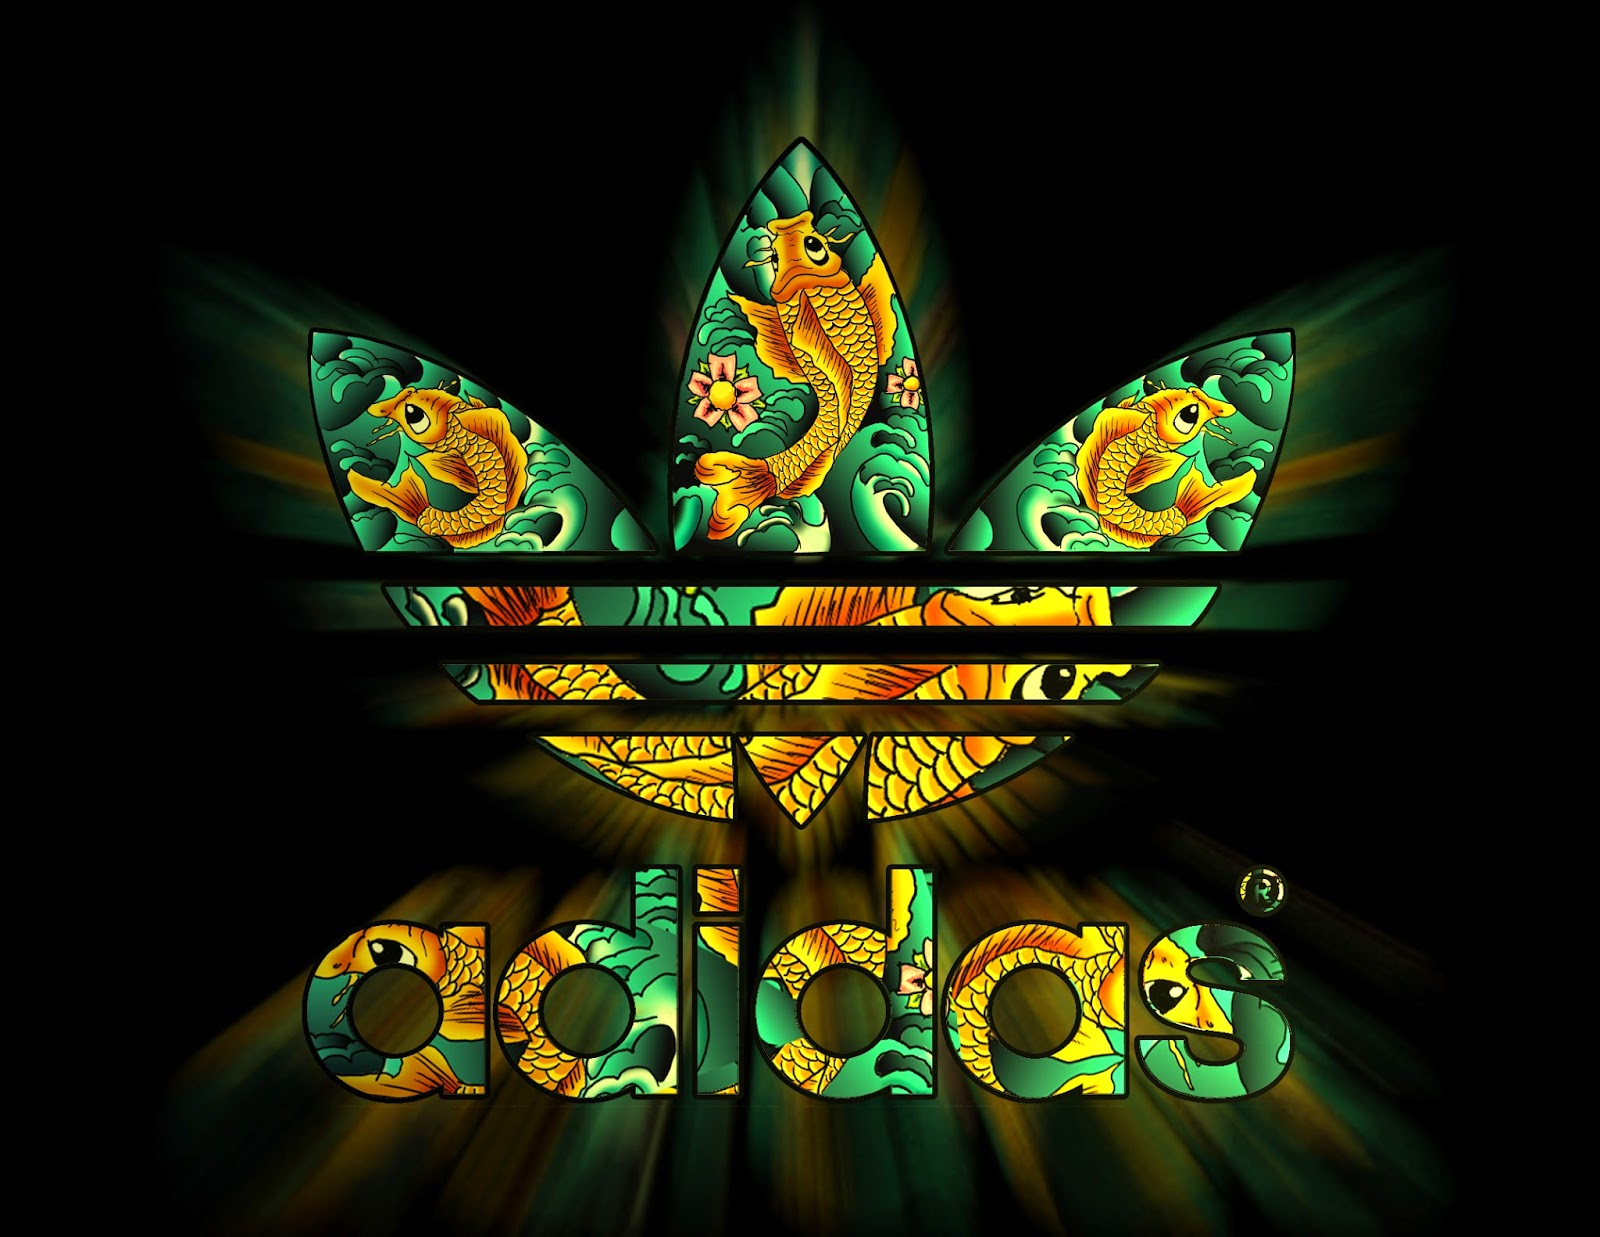 30+] Adidas Rasta Wallpapers on WallpaperSafari